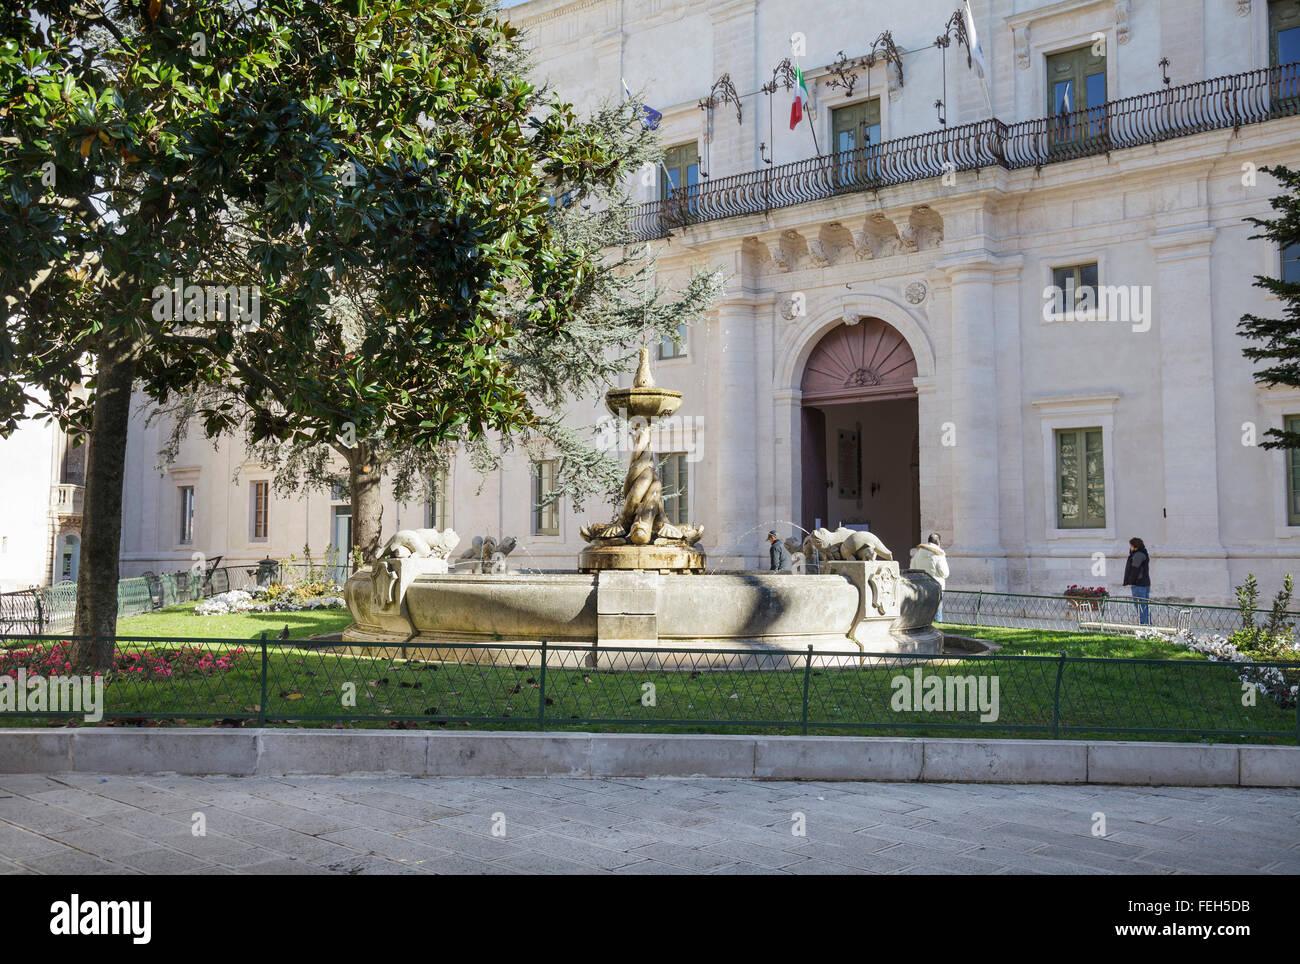 Piazza Roma and the Palazzo Ducale, Martina Franca, Taranto, Puglia, Italy - Stock Image